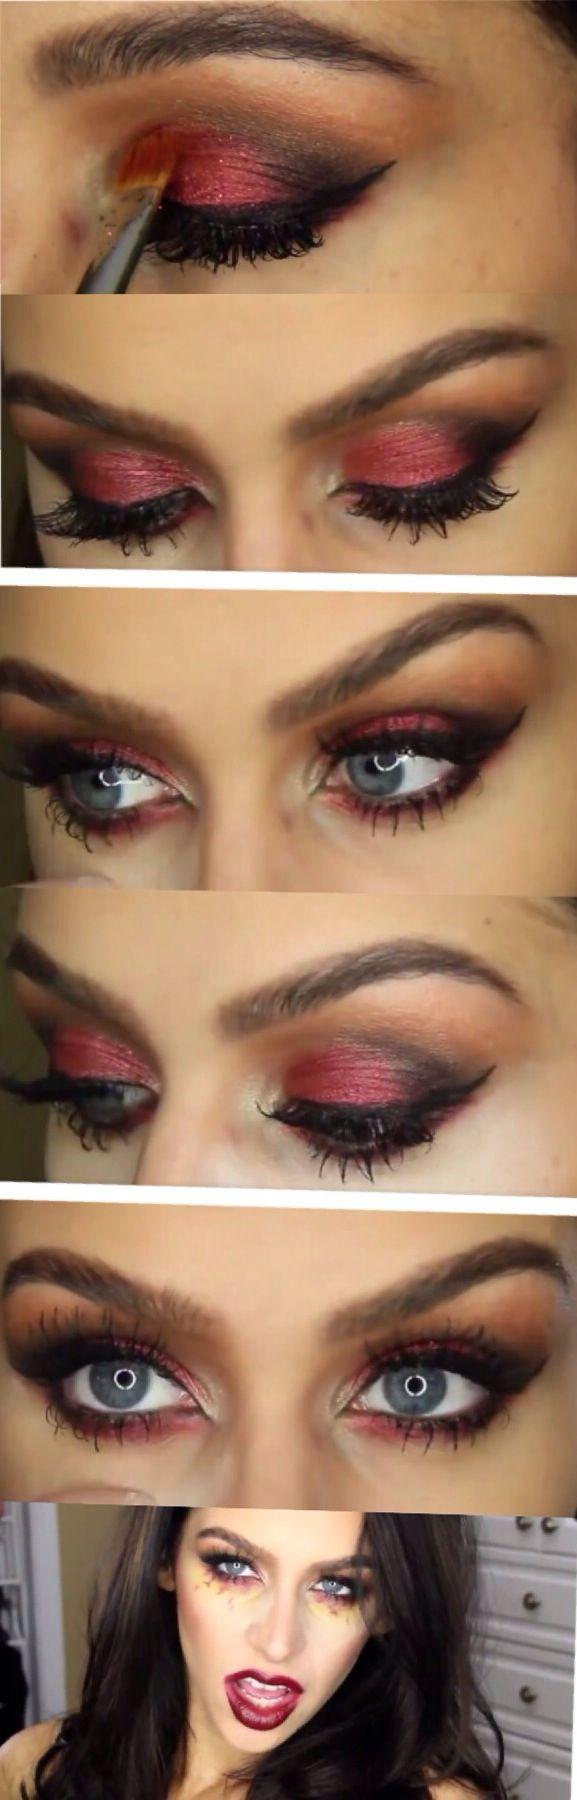 Carli bybel sexy vampire makeup tutorial products used bh take me carli bybel sexy vampire makeup tutorial products used bh take me to brazil palette baditri Image collections